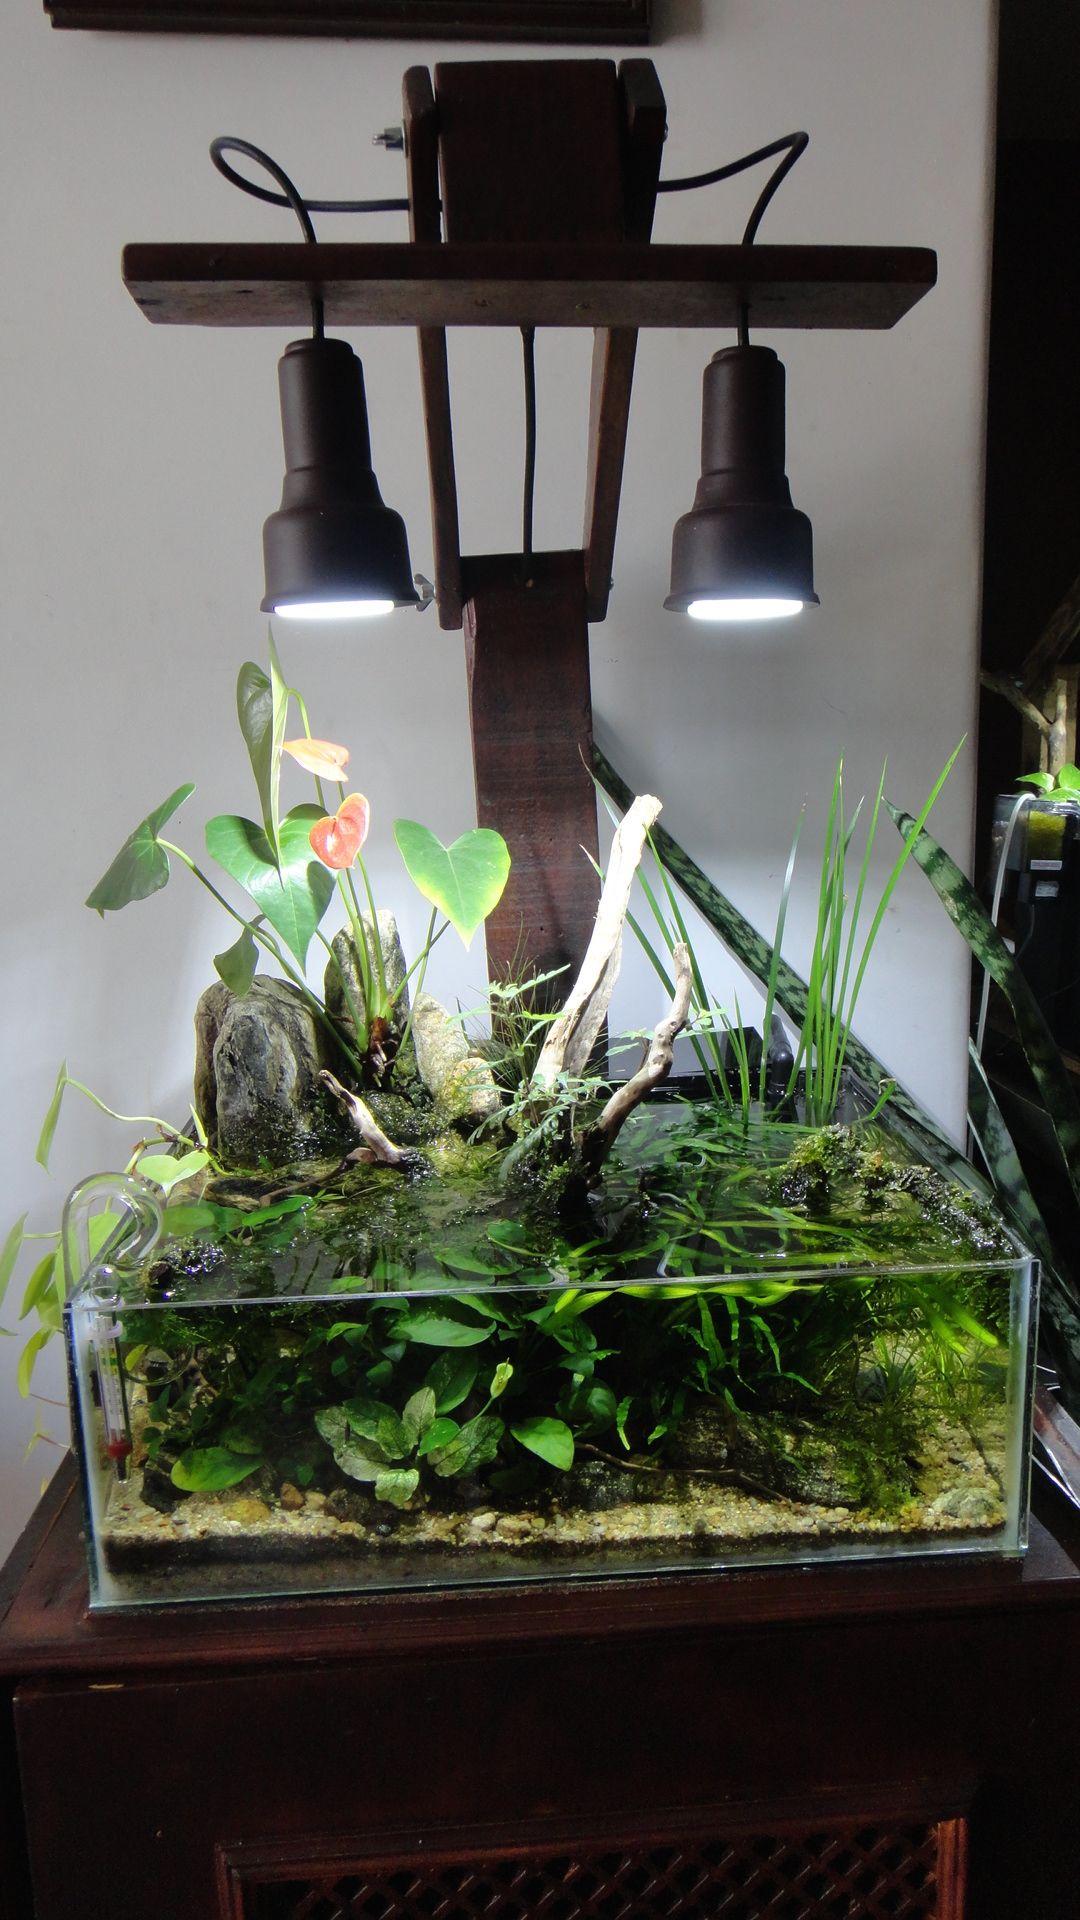 10 Live Coquina Clams If I Open a Zoo or Aquarium